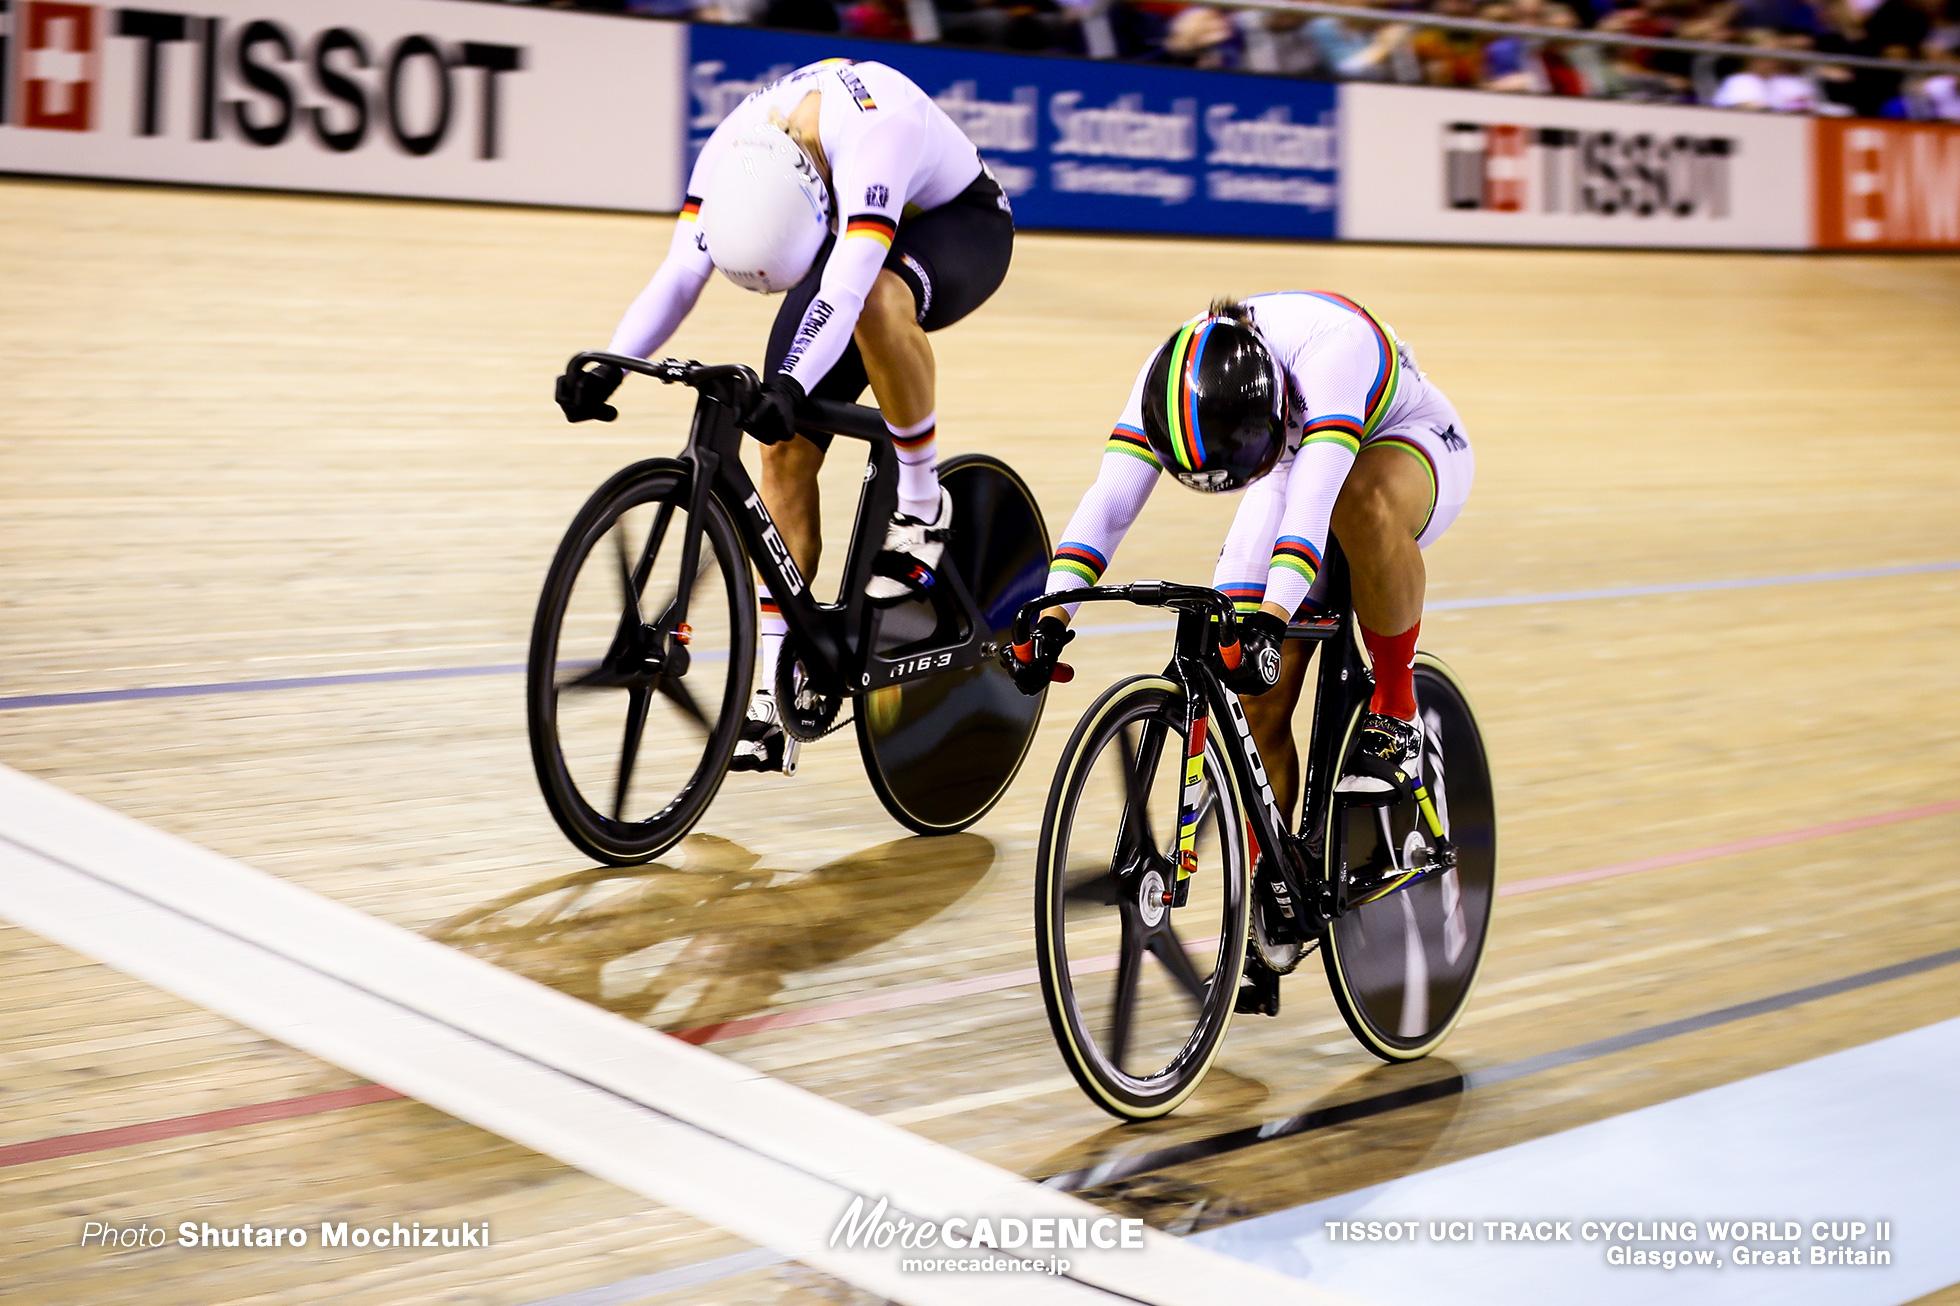 Final / Women's Sprint / TISSOT UCI TRACK CYCLING WORLD CUP II, Glasgow, Great Britain LEE Wai Sze リー・ワイジー 李慧詩, Emma HINZE エマ・ヒンツェ